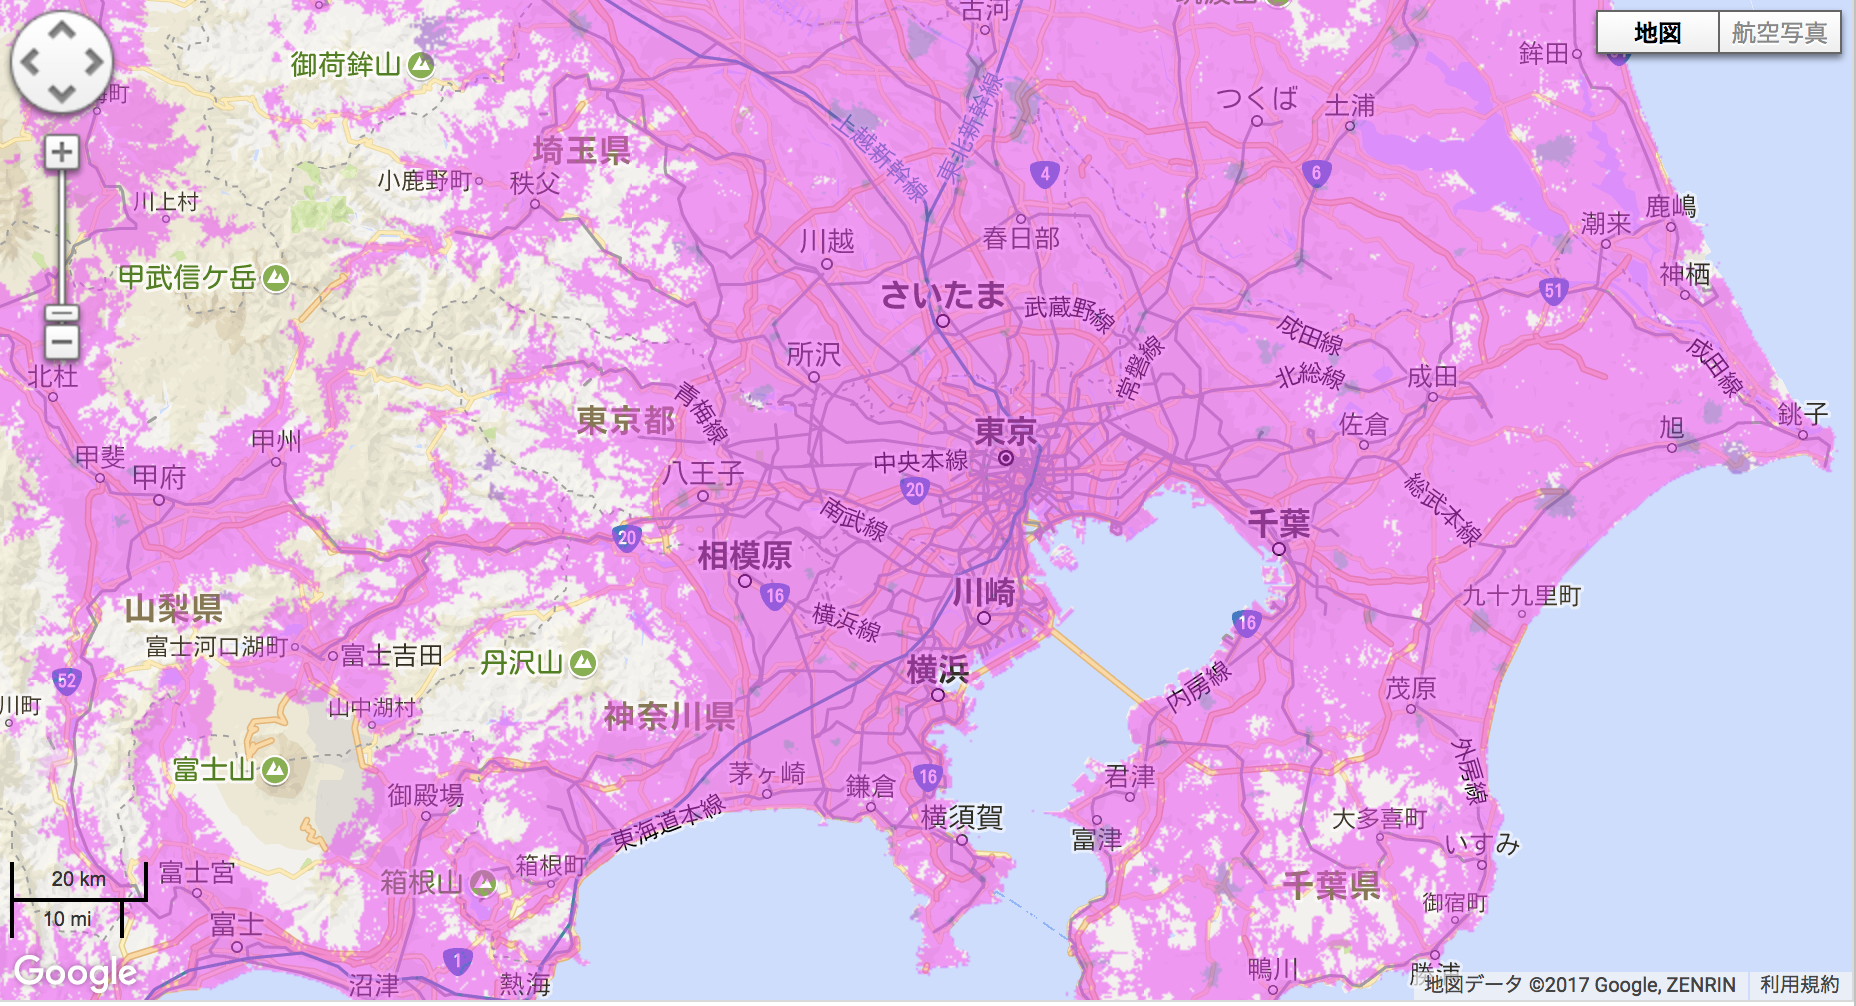 WiMAXの対象エリア地図。よほどの山間部でないかぎりエリア内となっている。